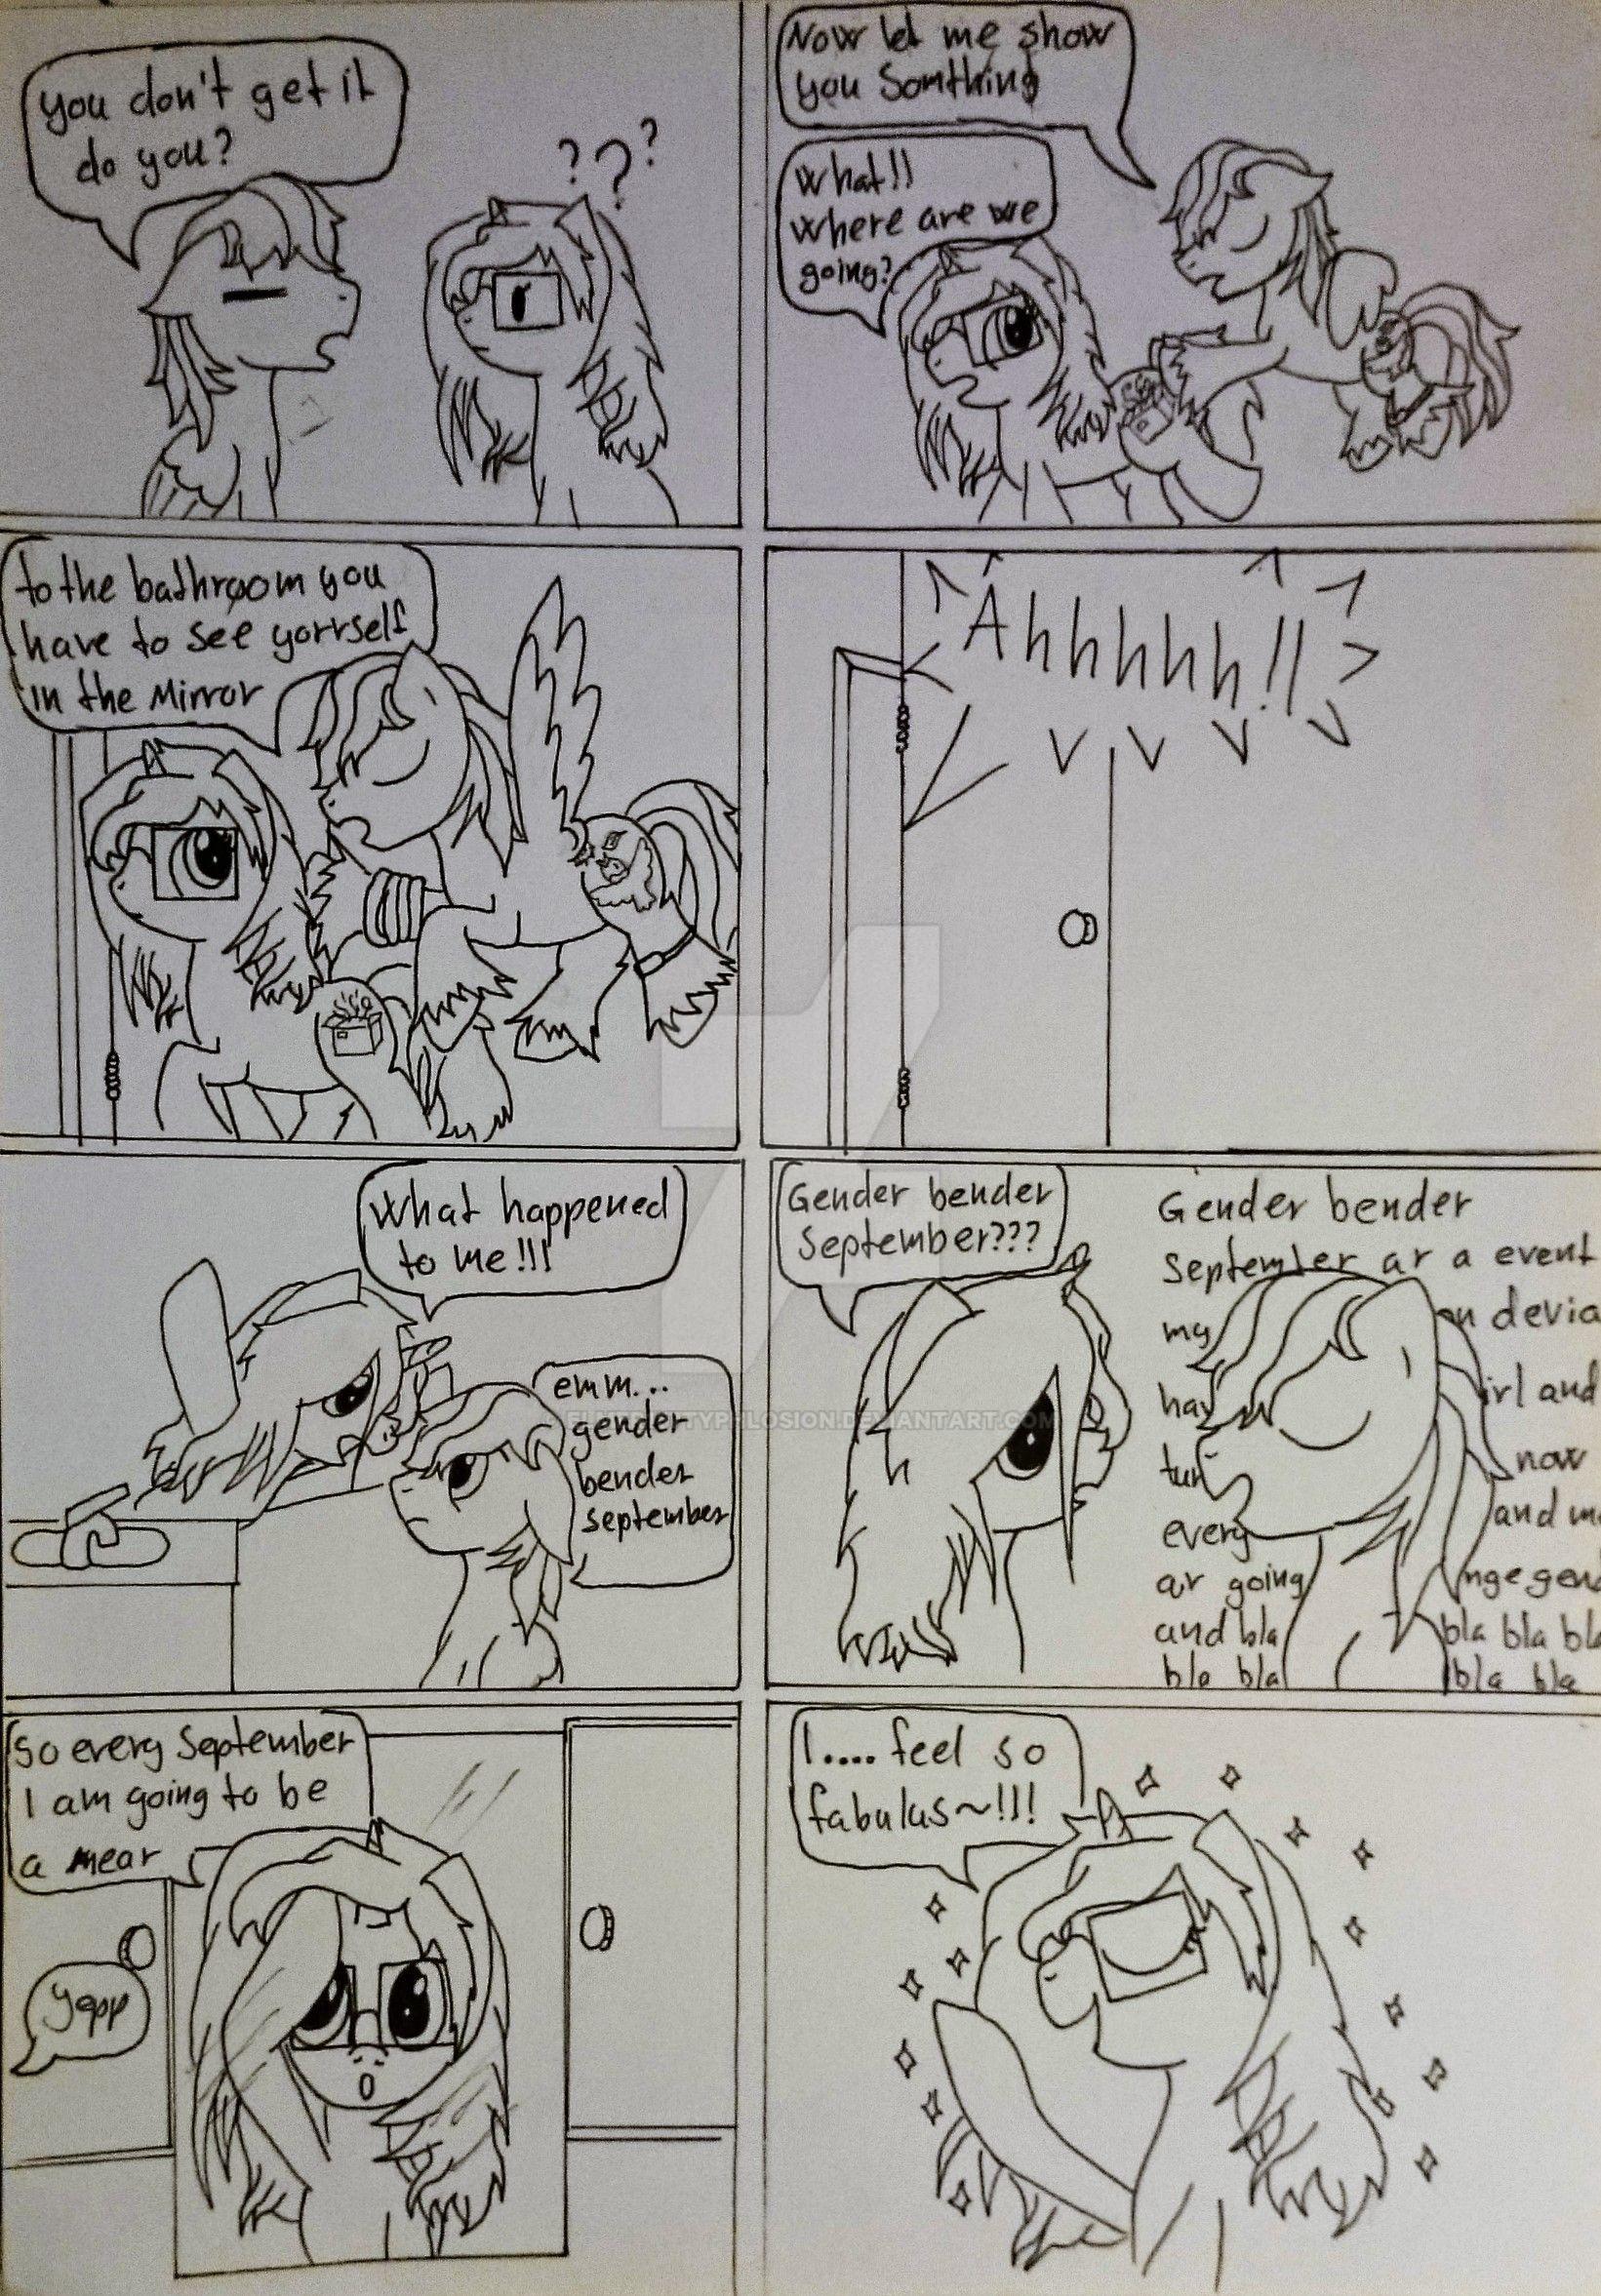 It's September (comic) #3 by Elmer157Typhlosion